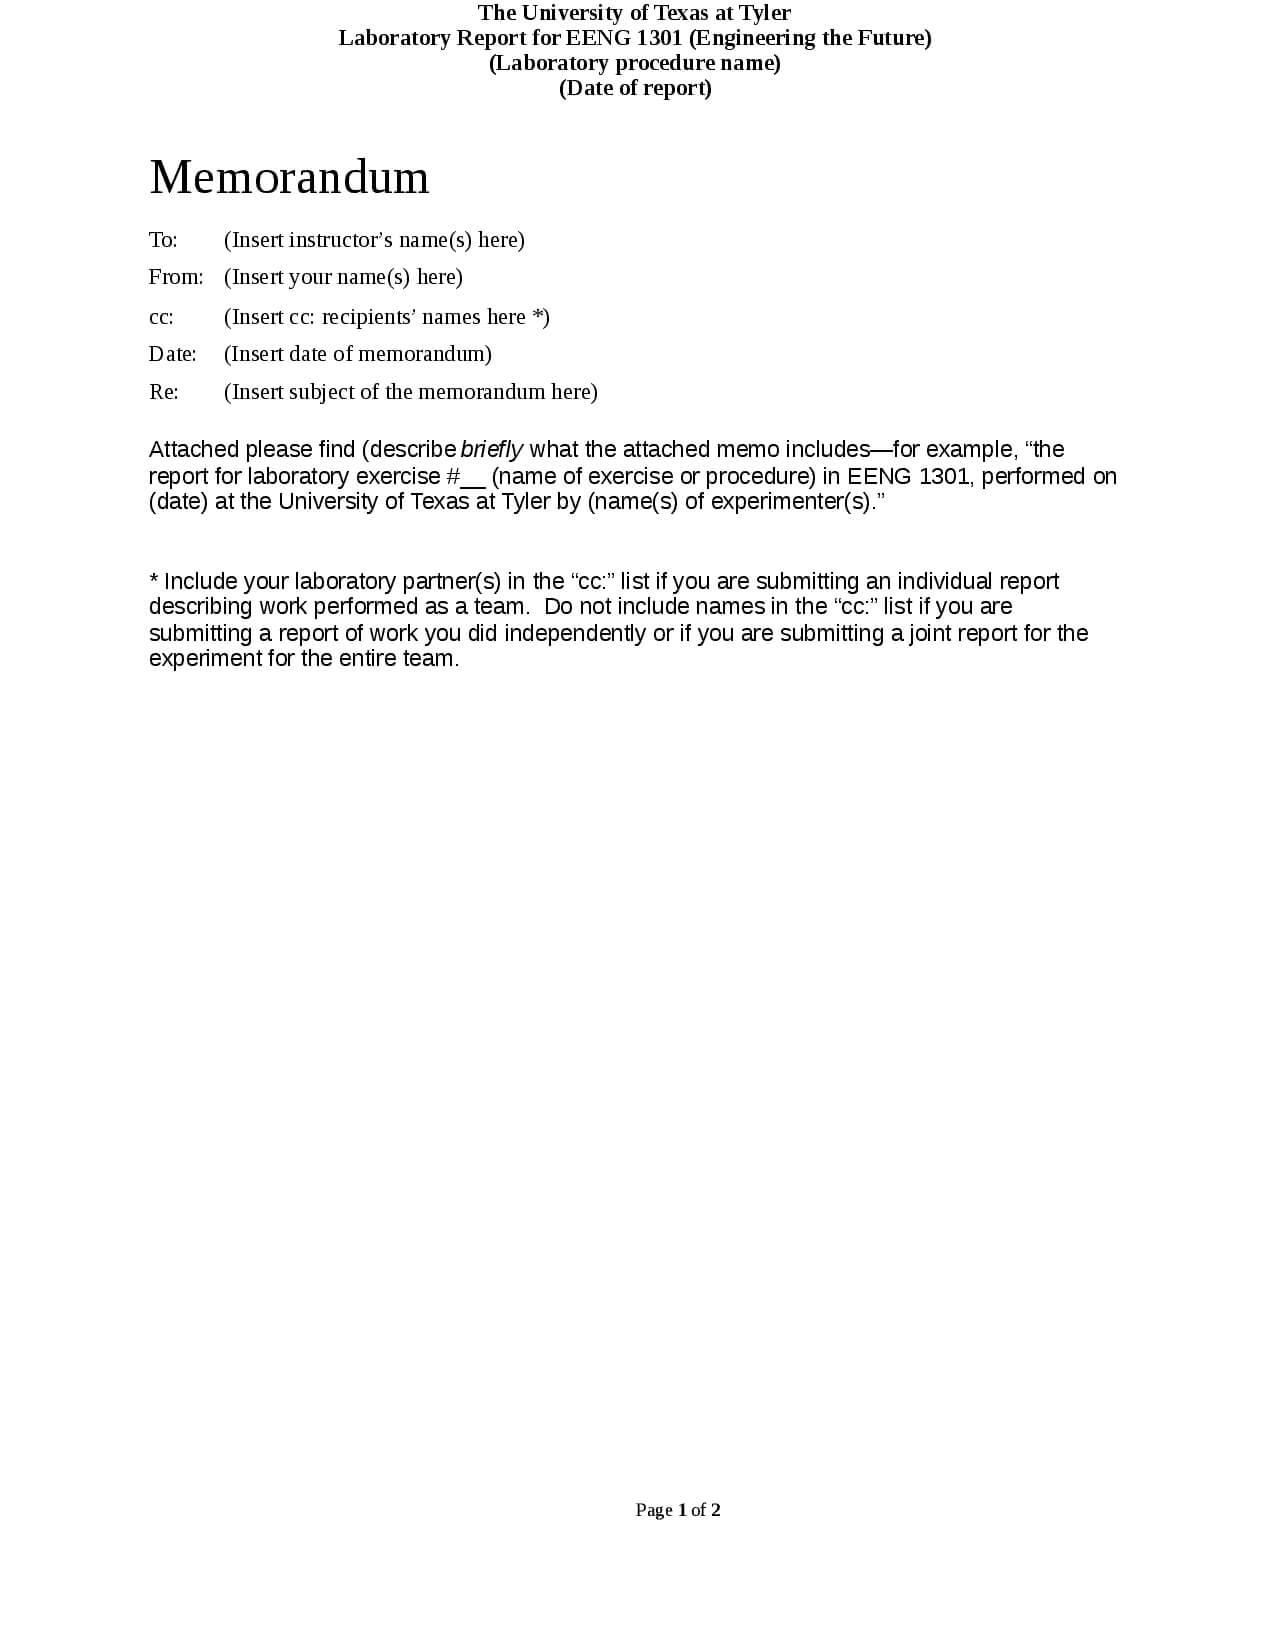 Format For Basic Memorandum Laboratory Reports - Docsity pertaining to Engineering Lab Report Template